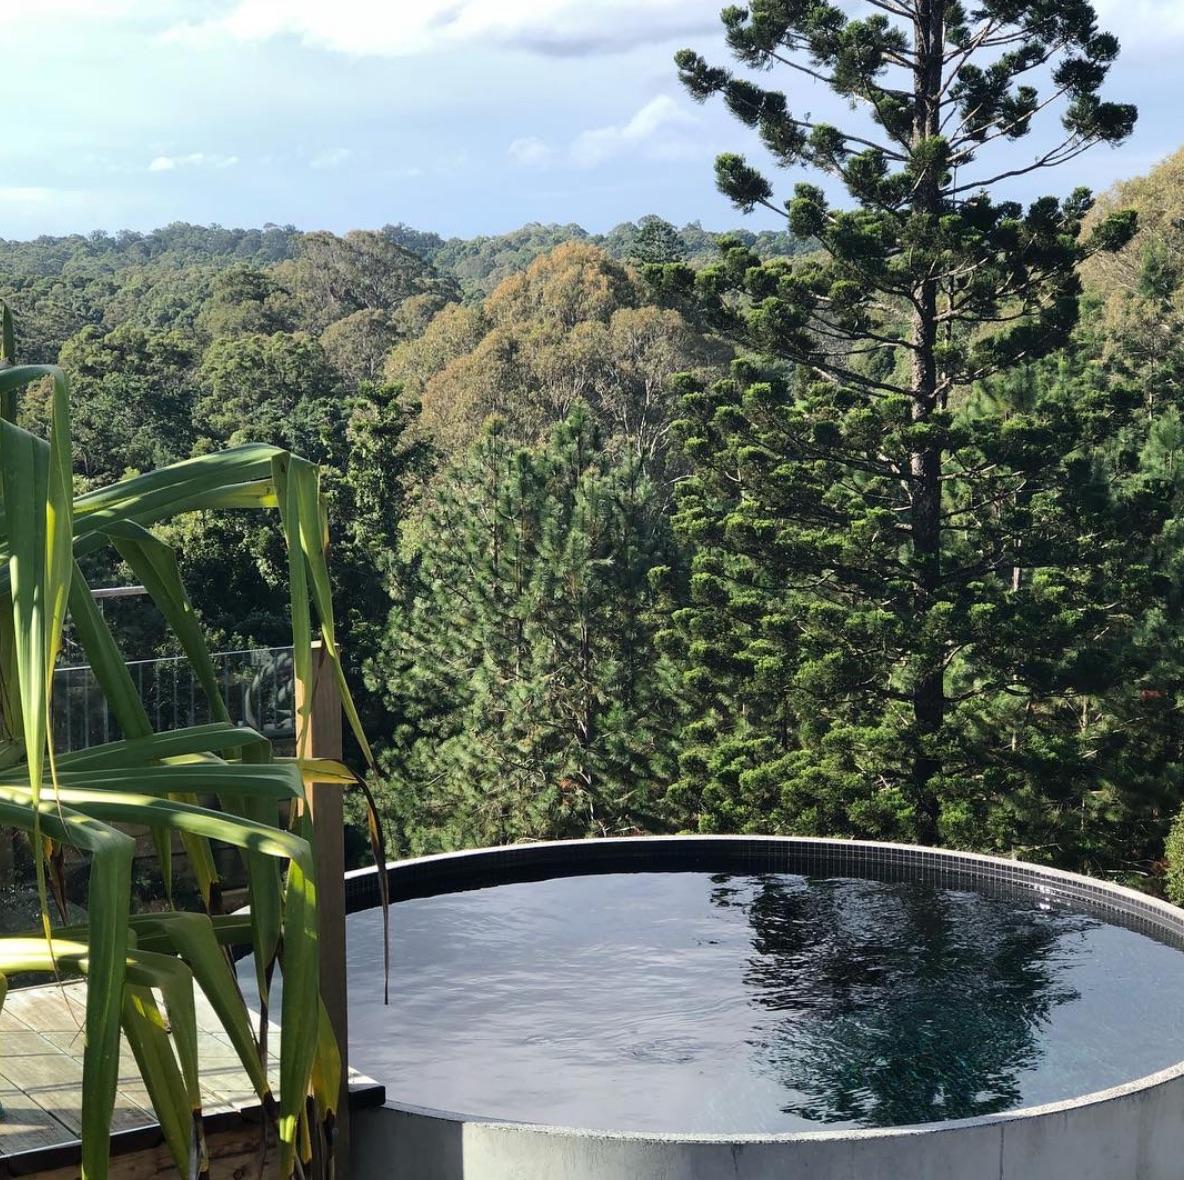 Small concrete plunge pool